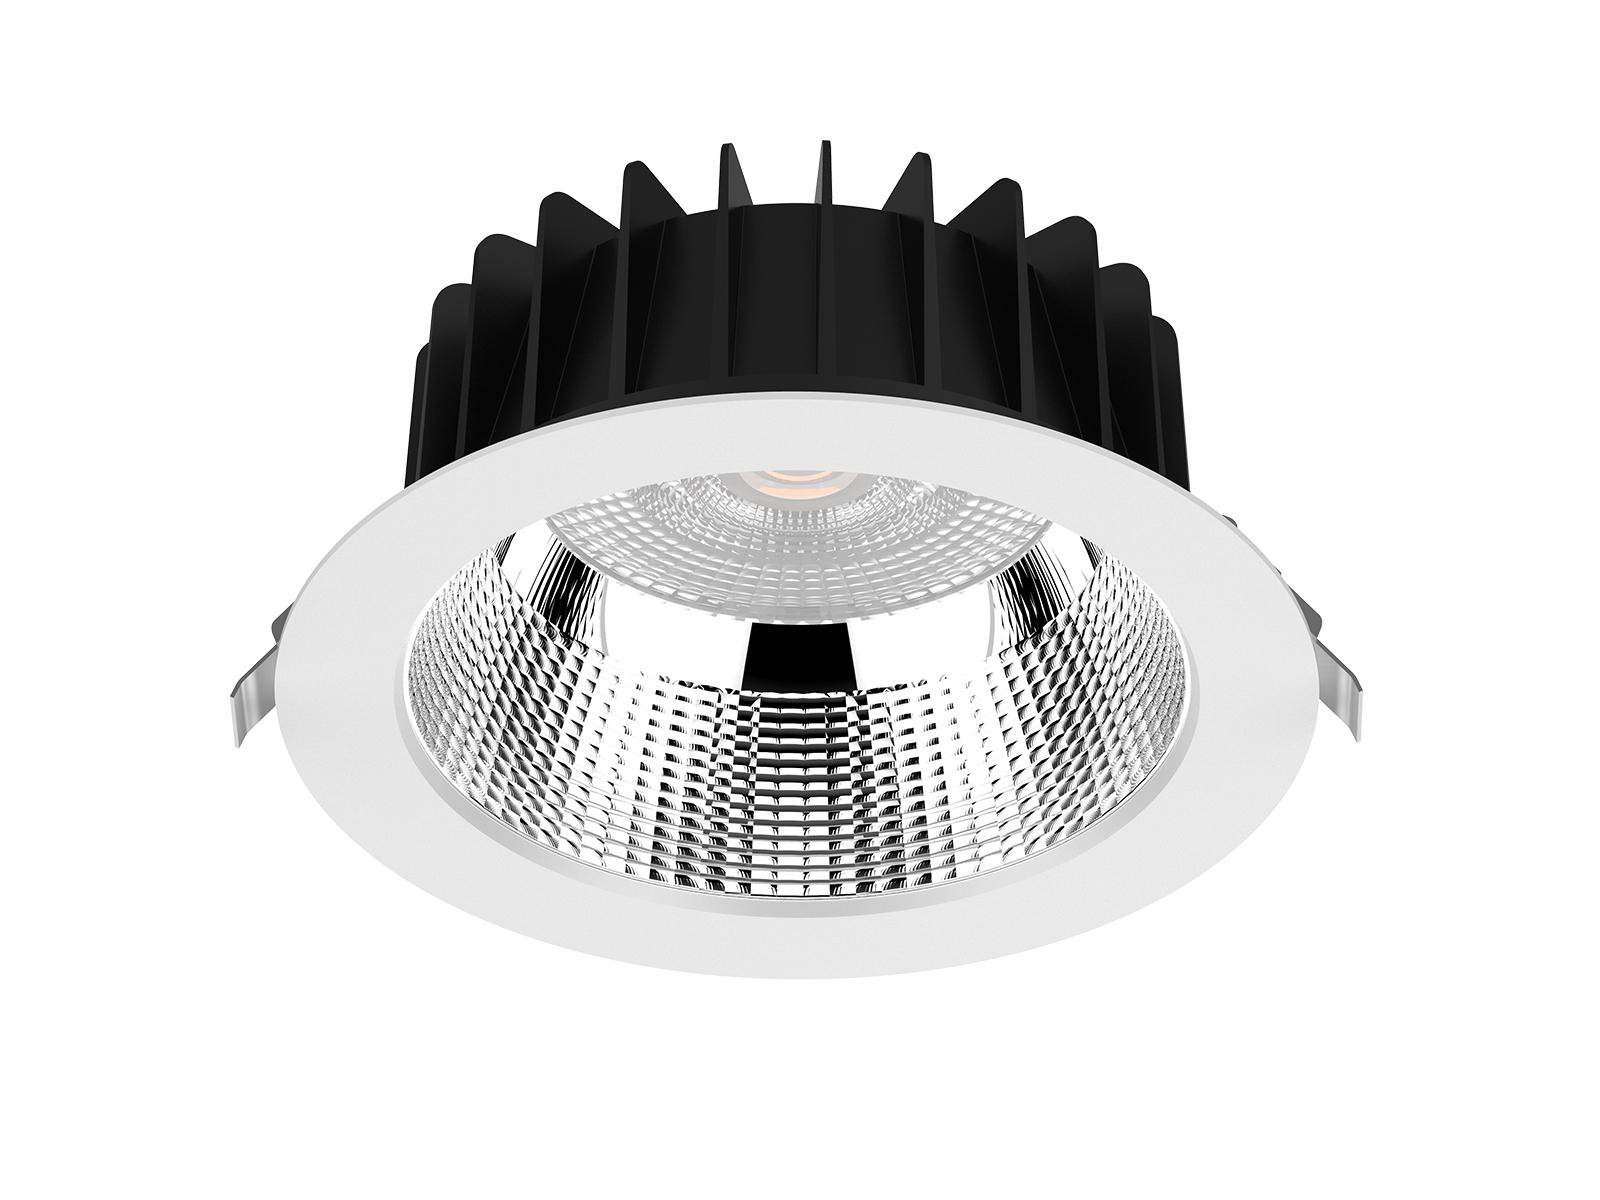 LED Downlight Xela von smart mit led gmbh